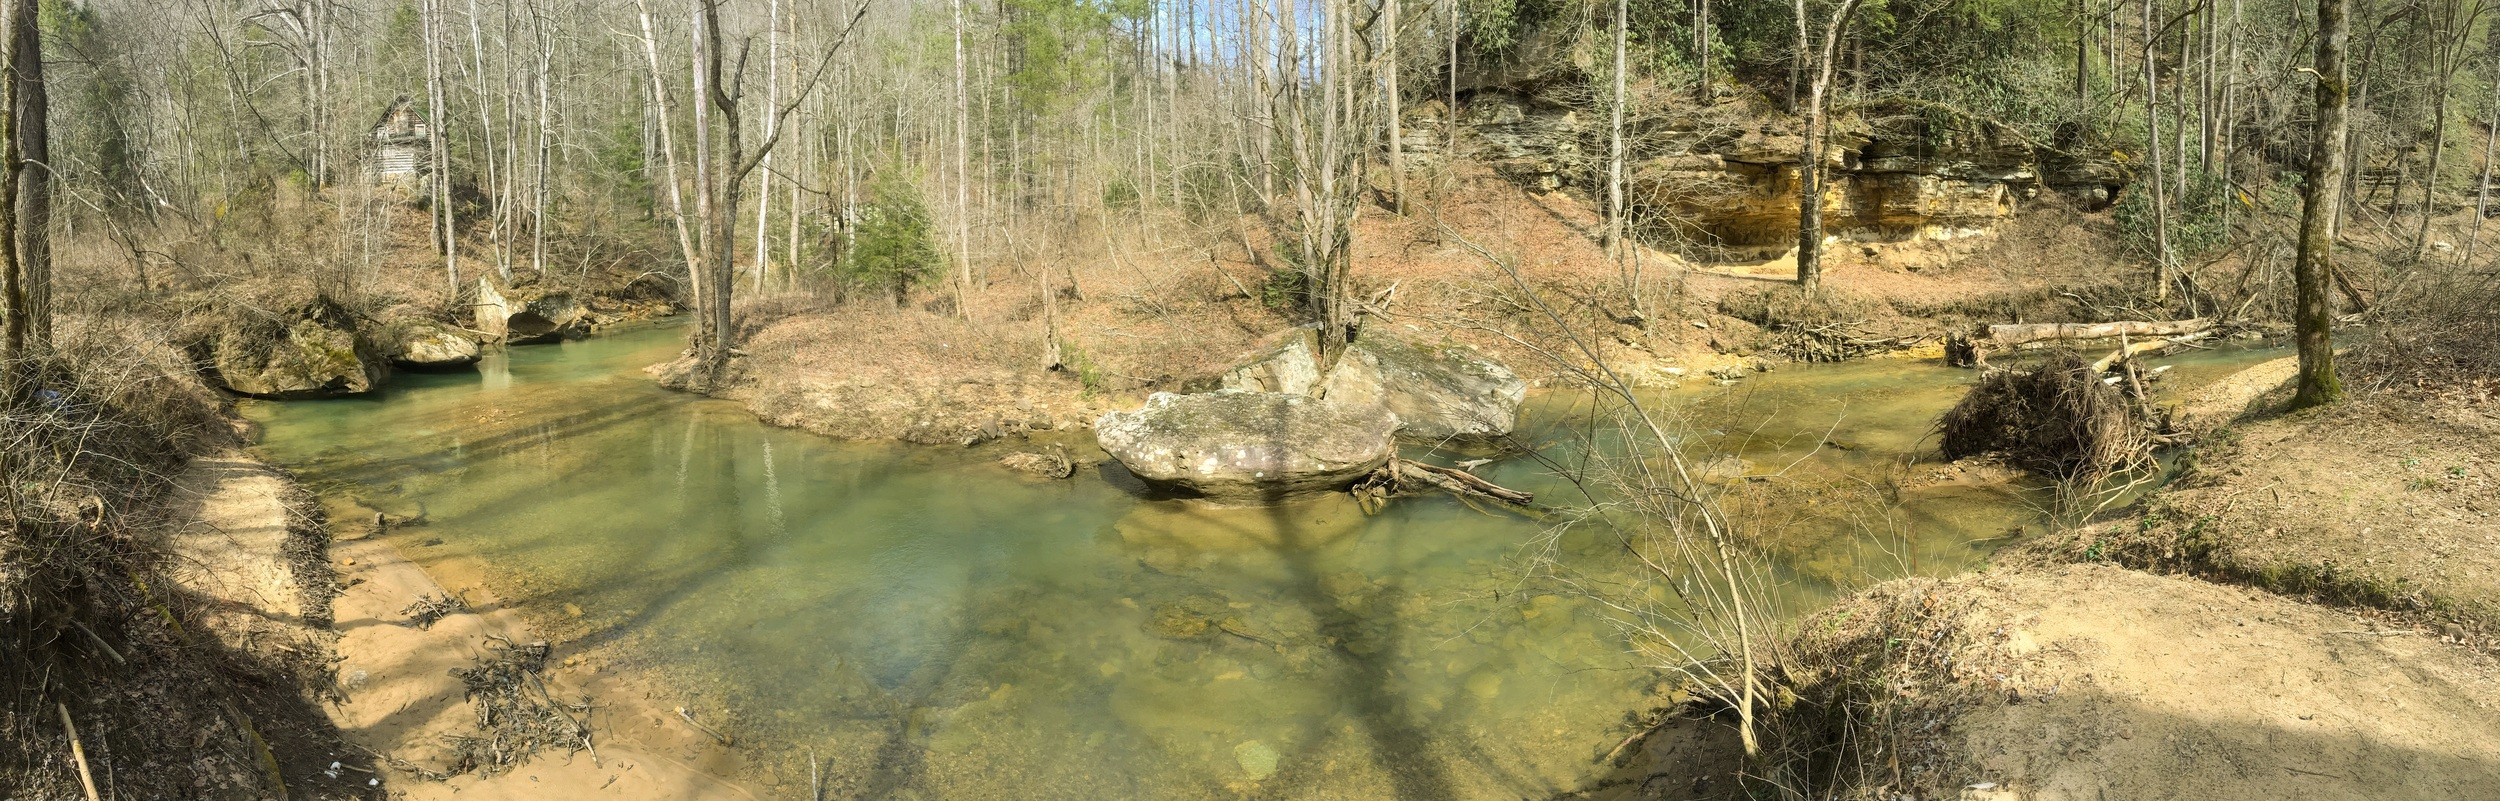 Swift Camp Creek spot aka secret spot.